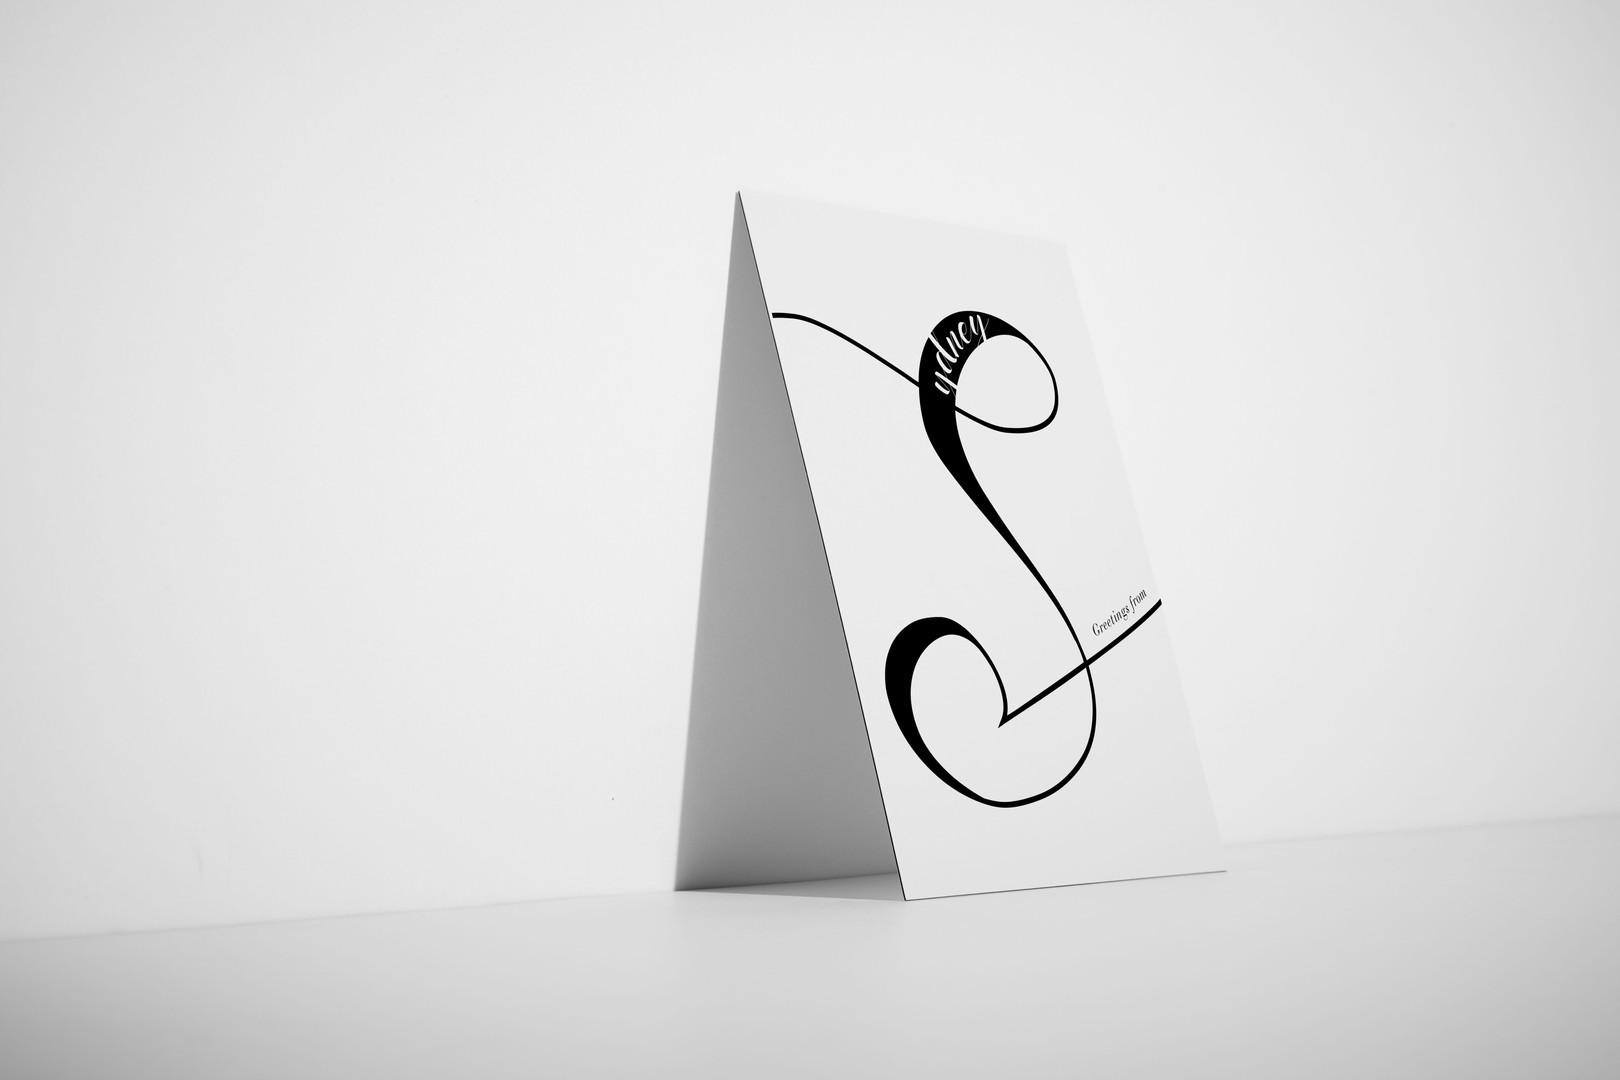 kleoncards_wall_sydney.jpg